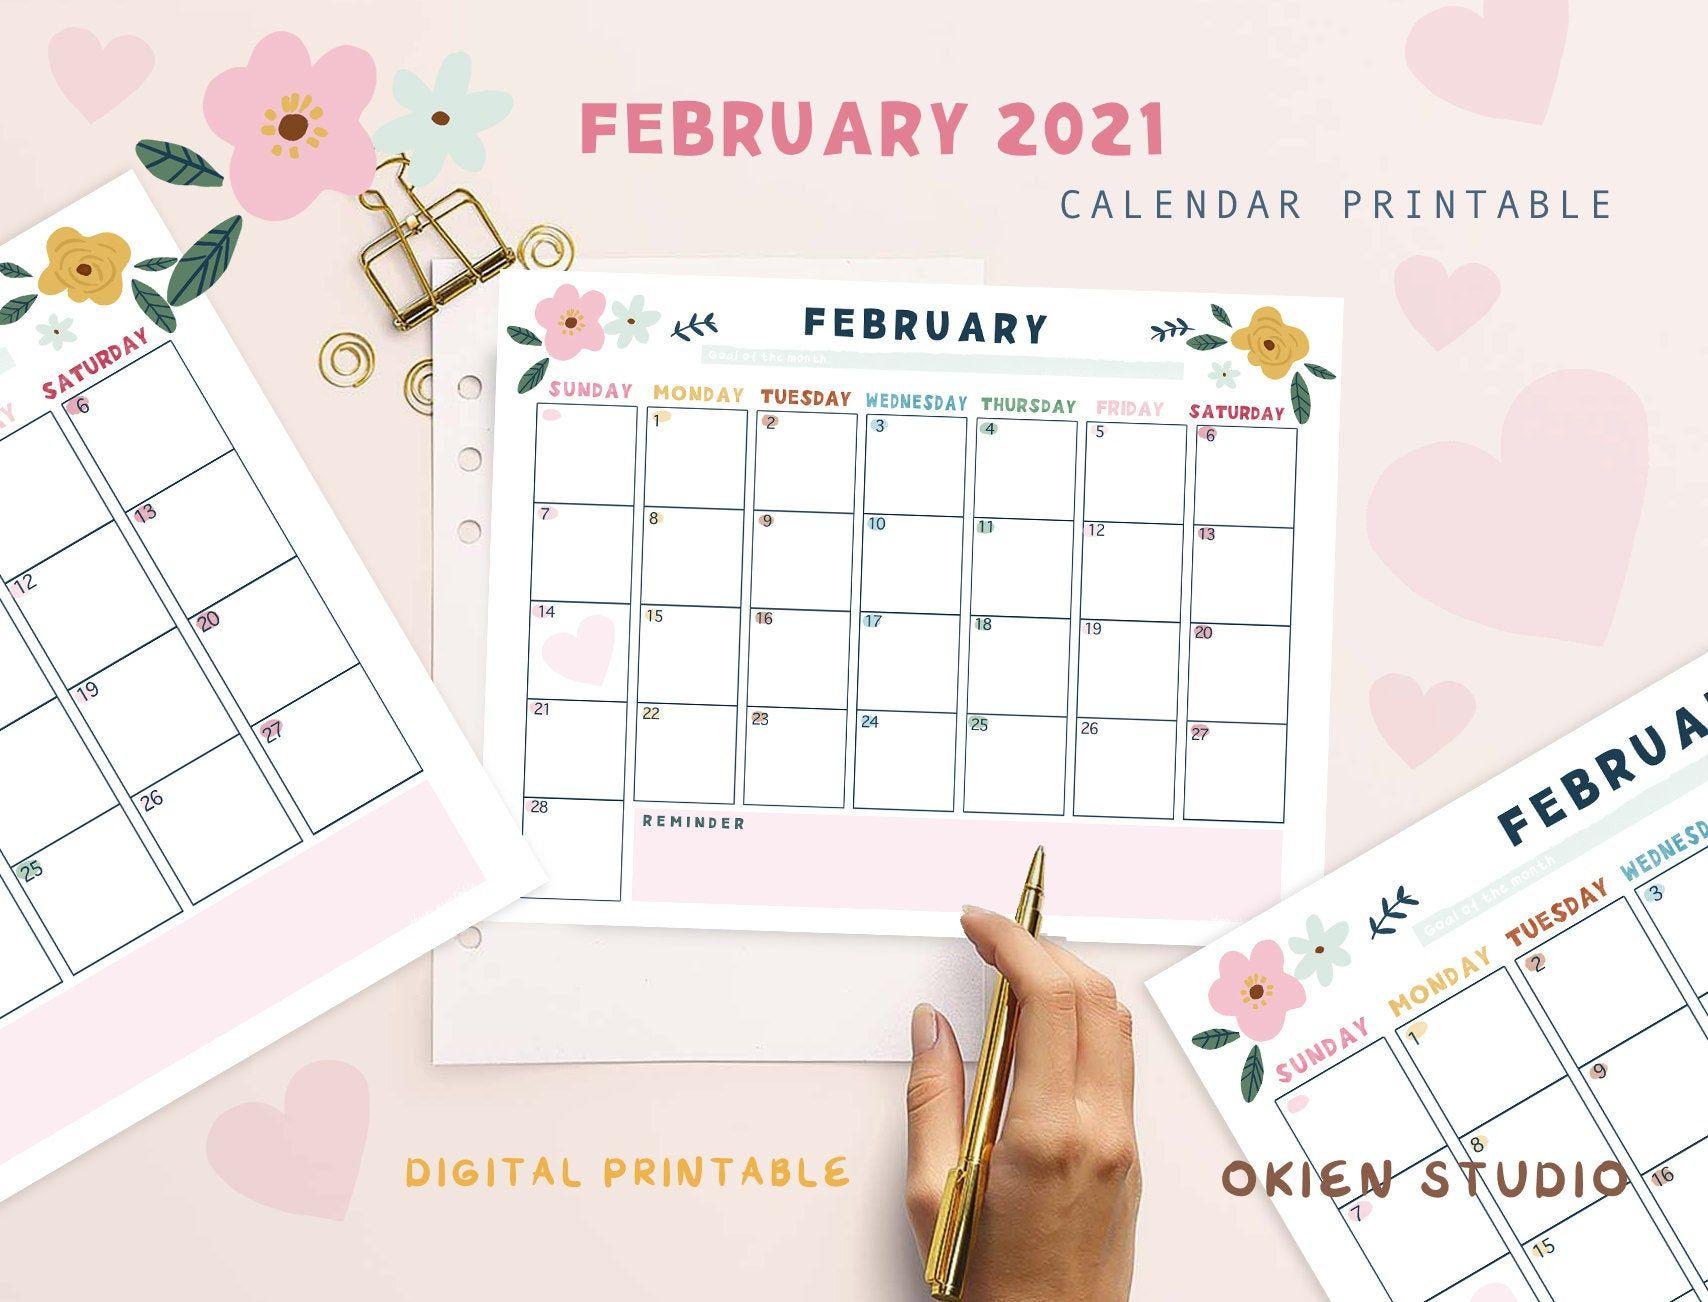 February 2021 Feb Calendar Feb Monthly Calendar Valentines Day Printable Pink Calendar Goodnotes Calend Pink Calendar Undated Monthly Planner Feb Calendar